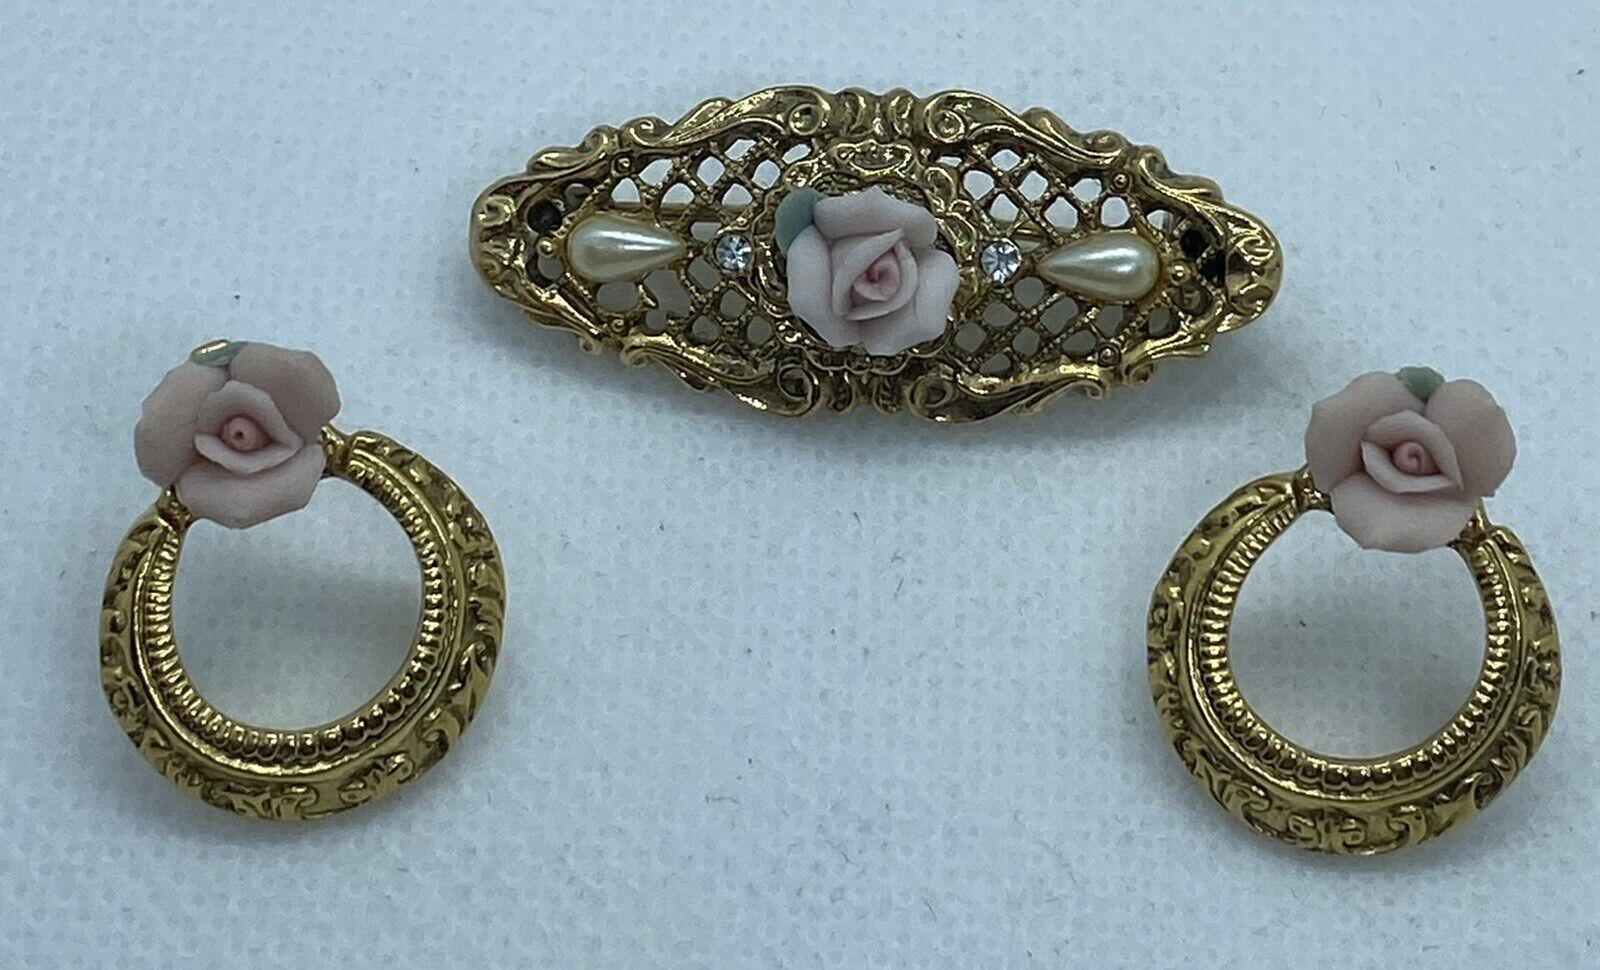 Vintage Ornate Gold Tone Lace Porcelain Rose Pear… - image 2